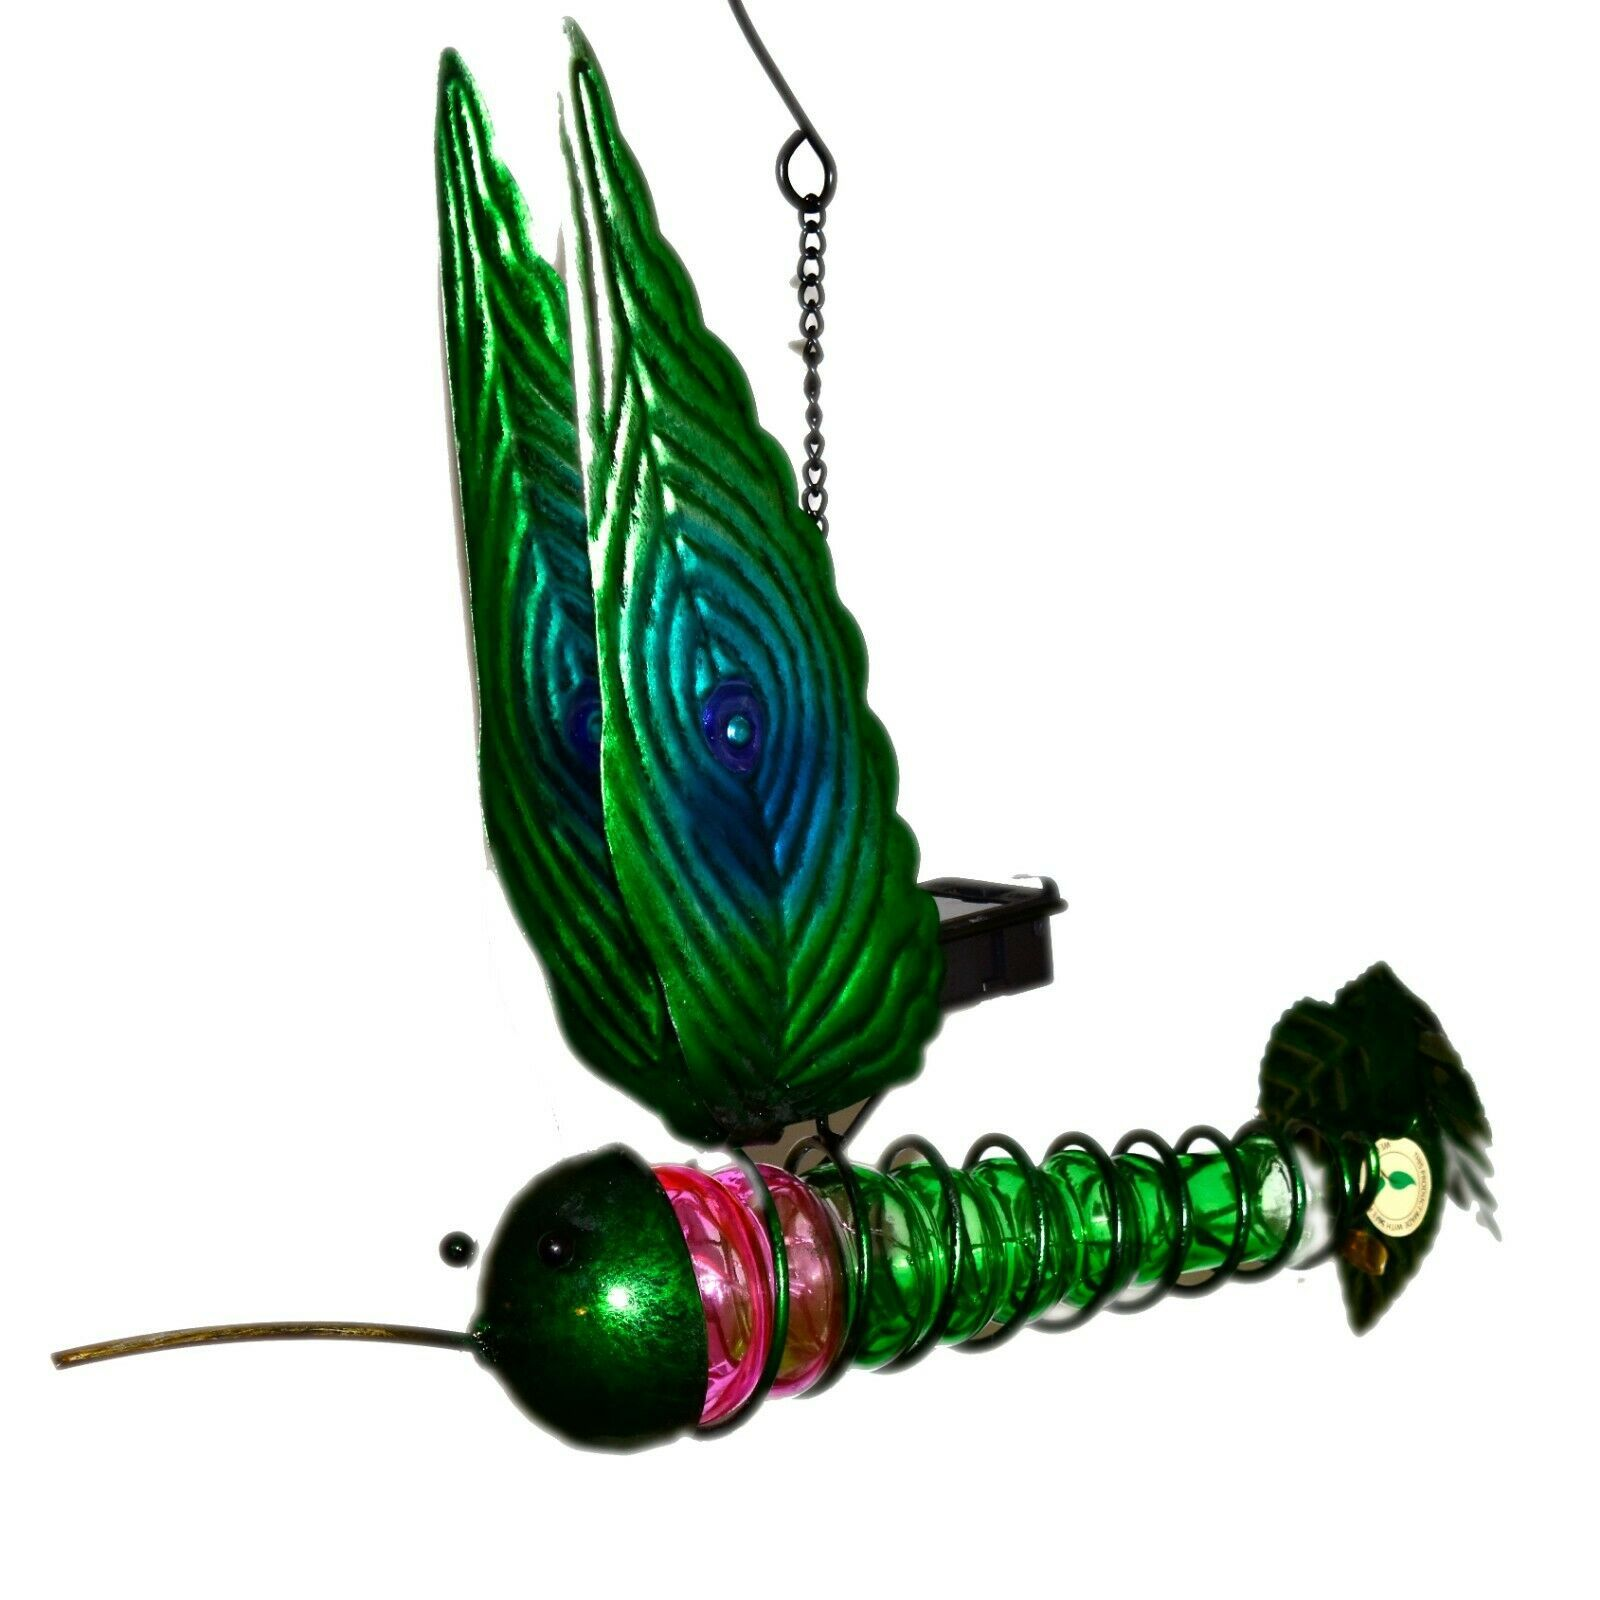 Painted Metal & Glass Solar Powered Light Garden Decoration Hummingbird Decor